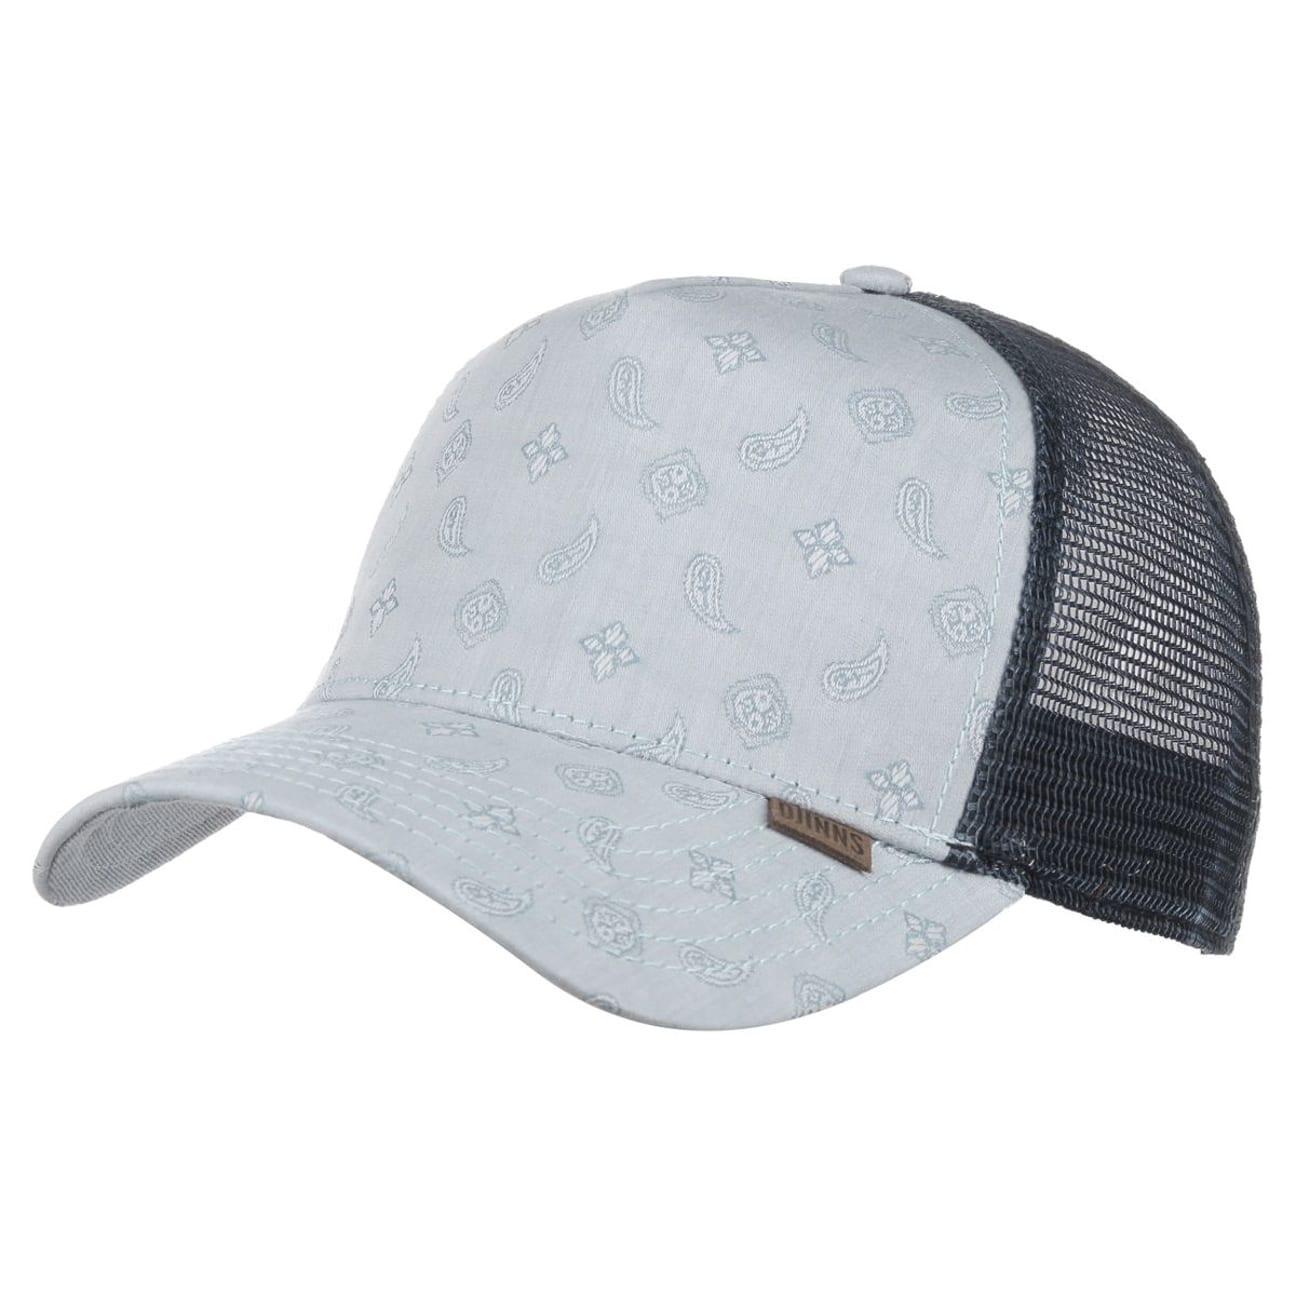 oxford paisley trucker cap by djinns gbp 19 95 hats. Black Bedroom Furniture Sets. Home Design Ideas